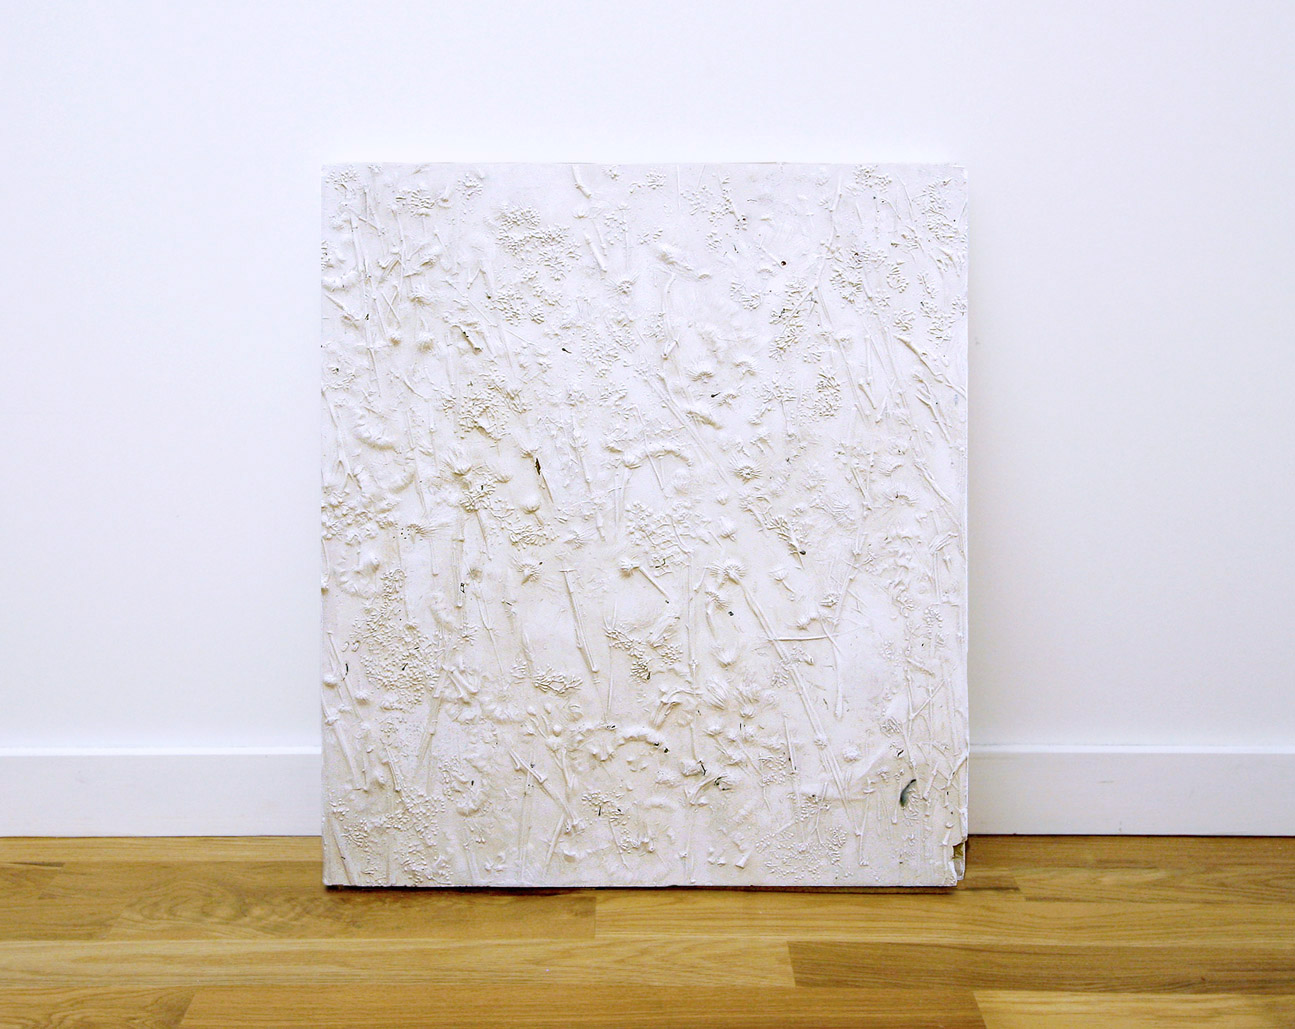 Garden (eucalyptus), plaster, 2016